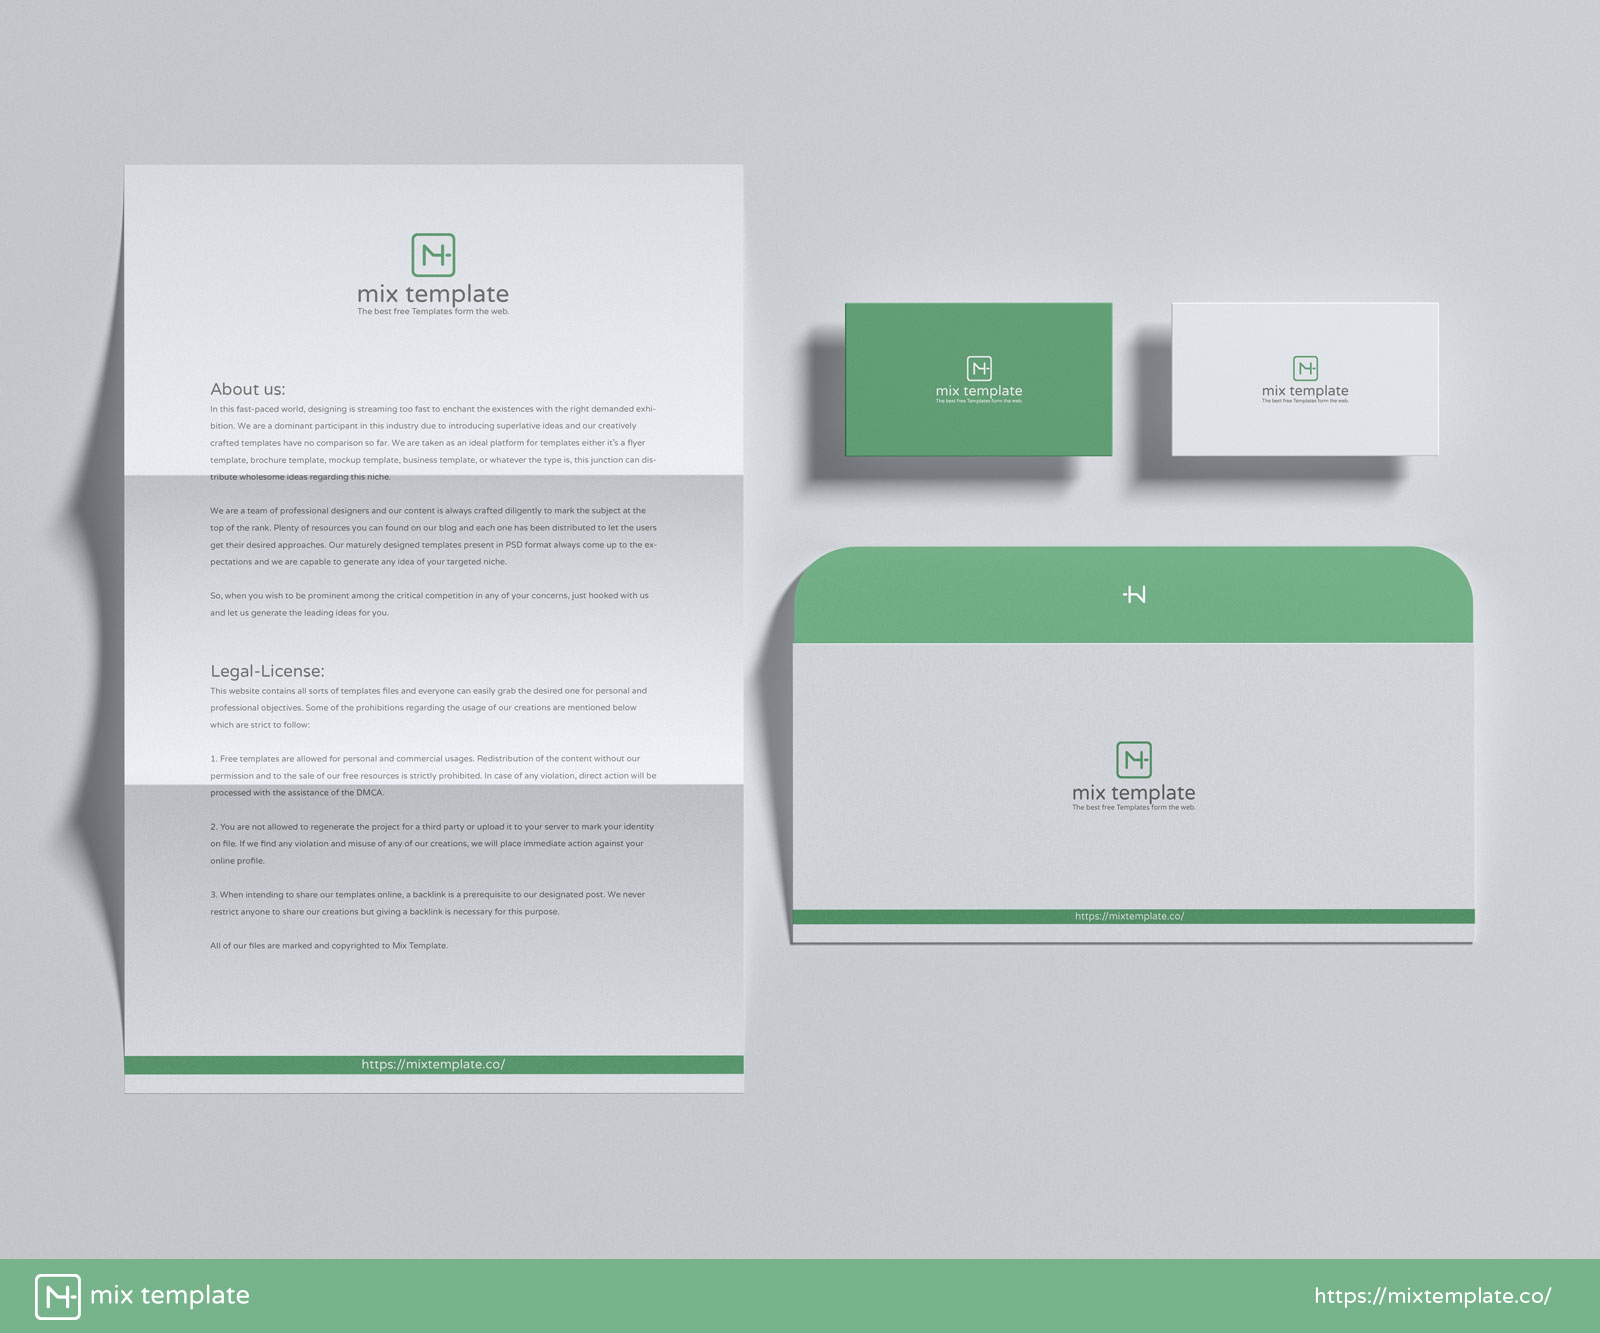 Free-PSD-Modern-Branding-Stationery-Mockup-Template